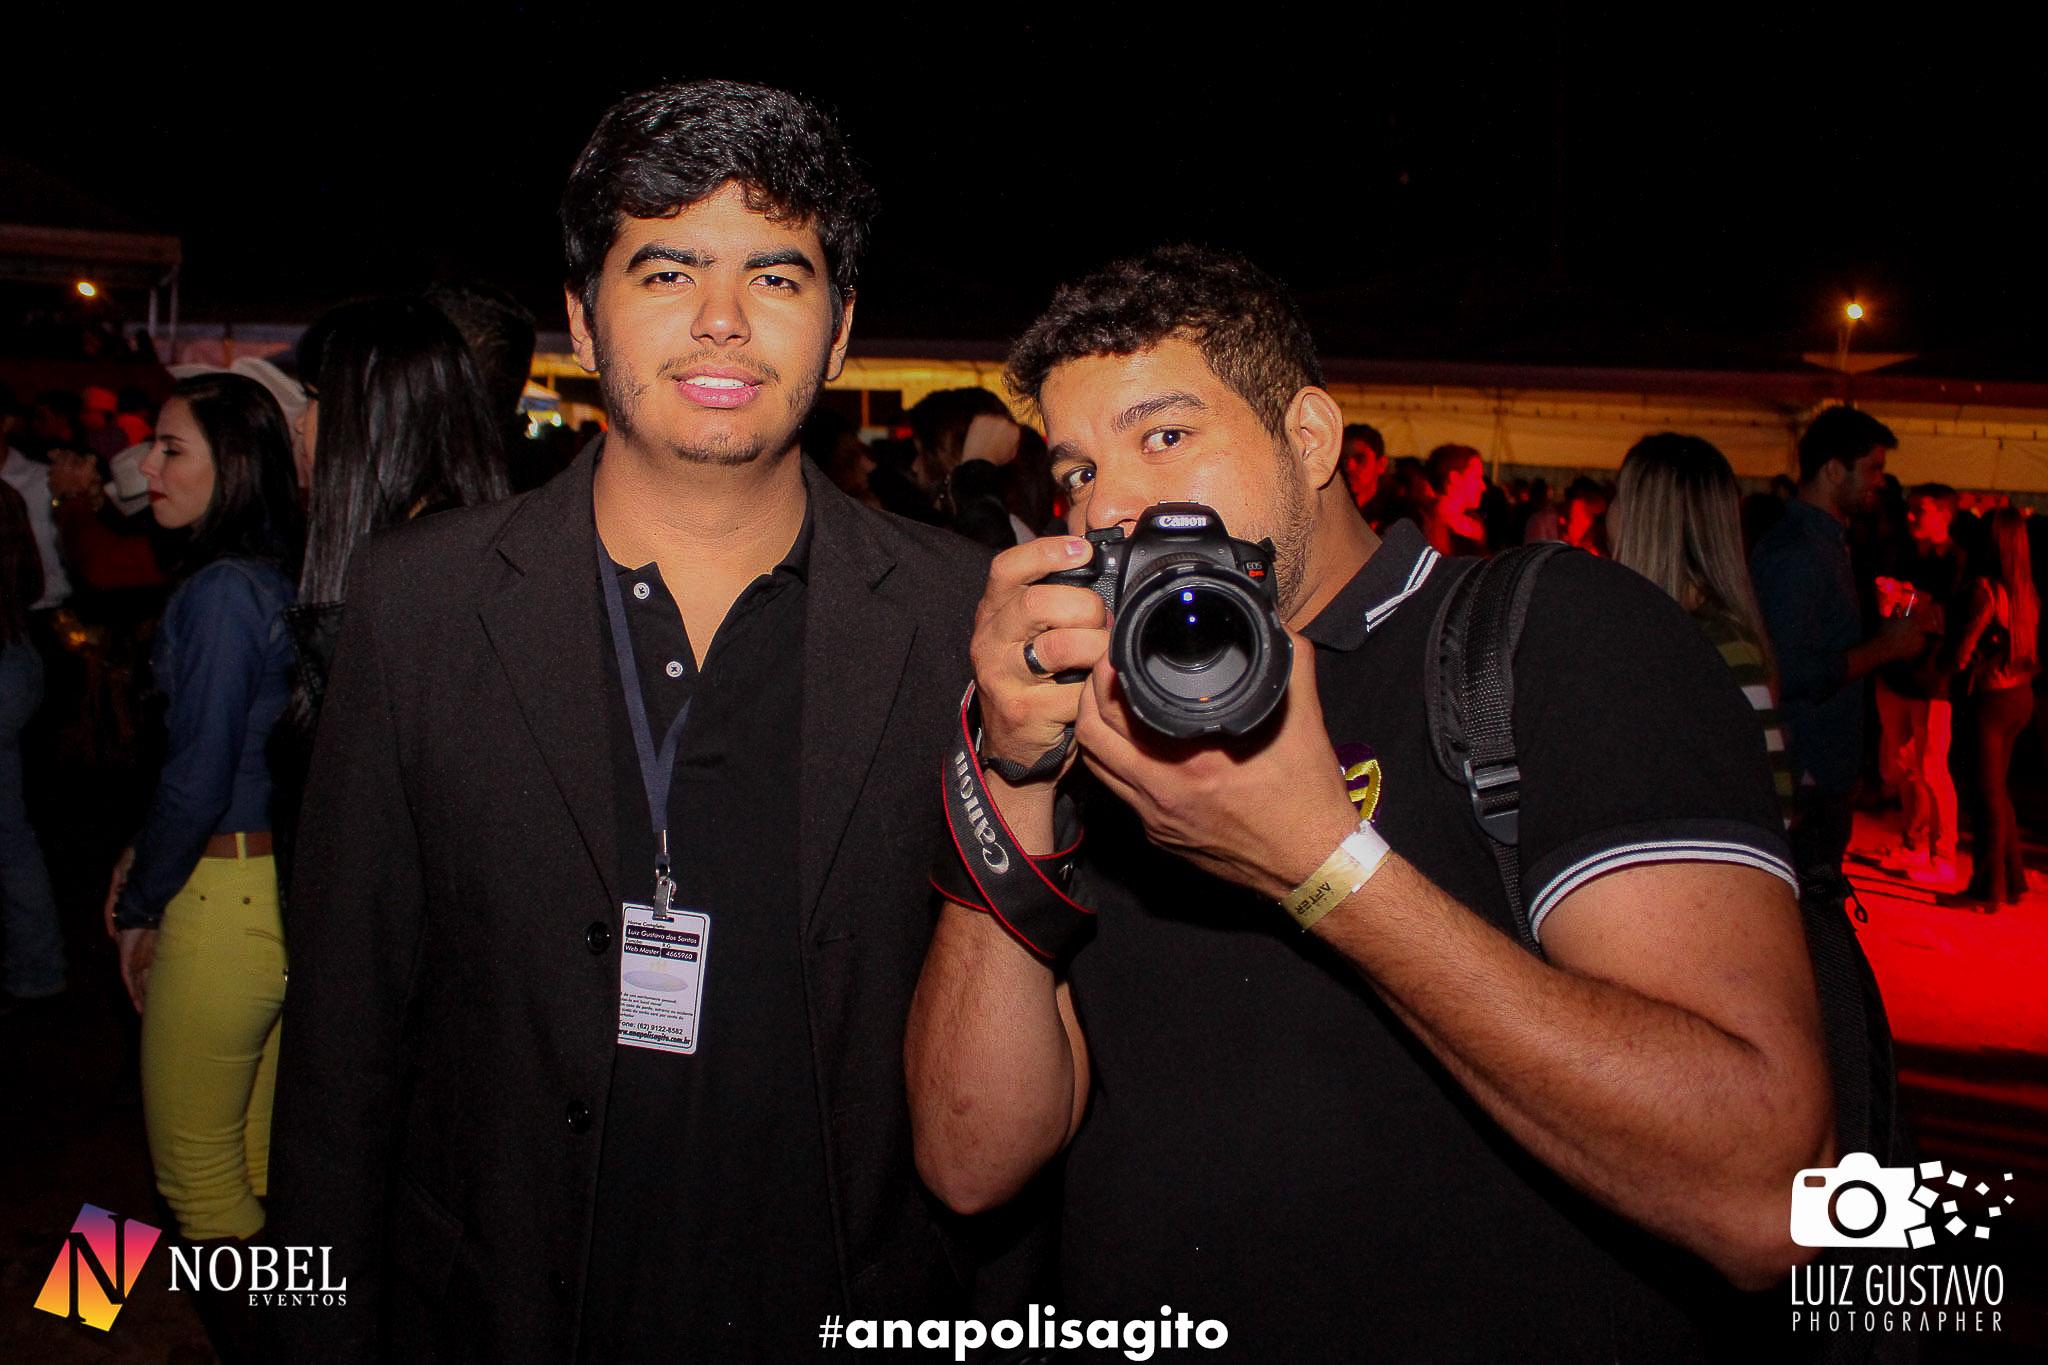 Luiz Gustavo Photographer-205